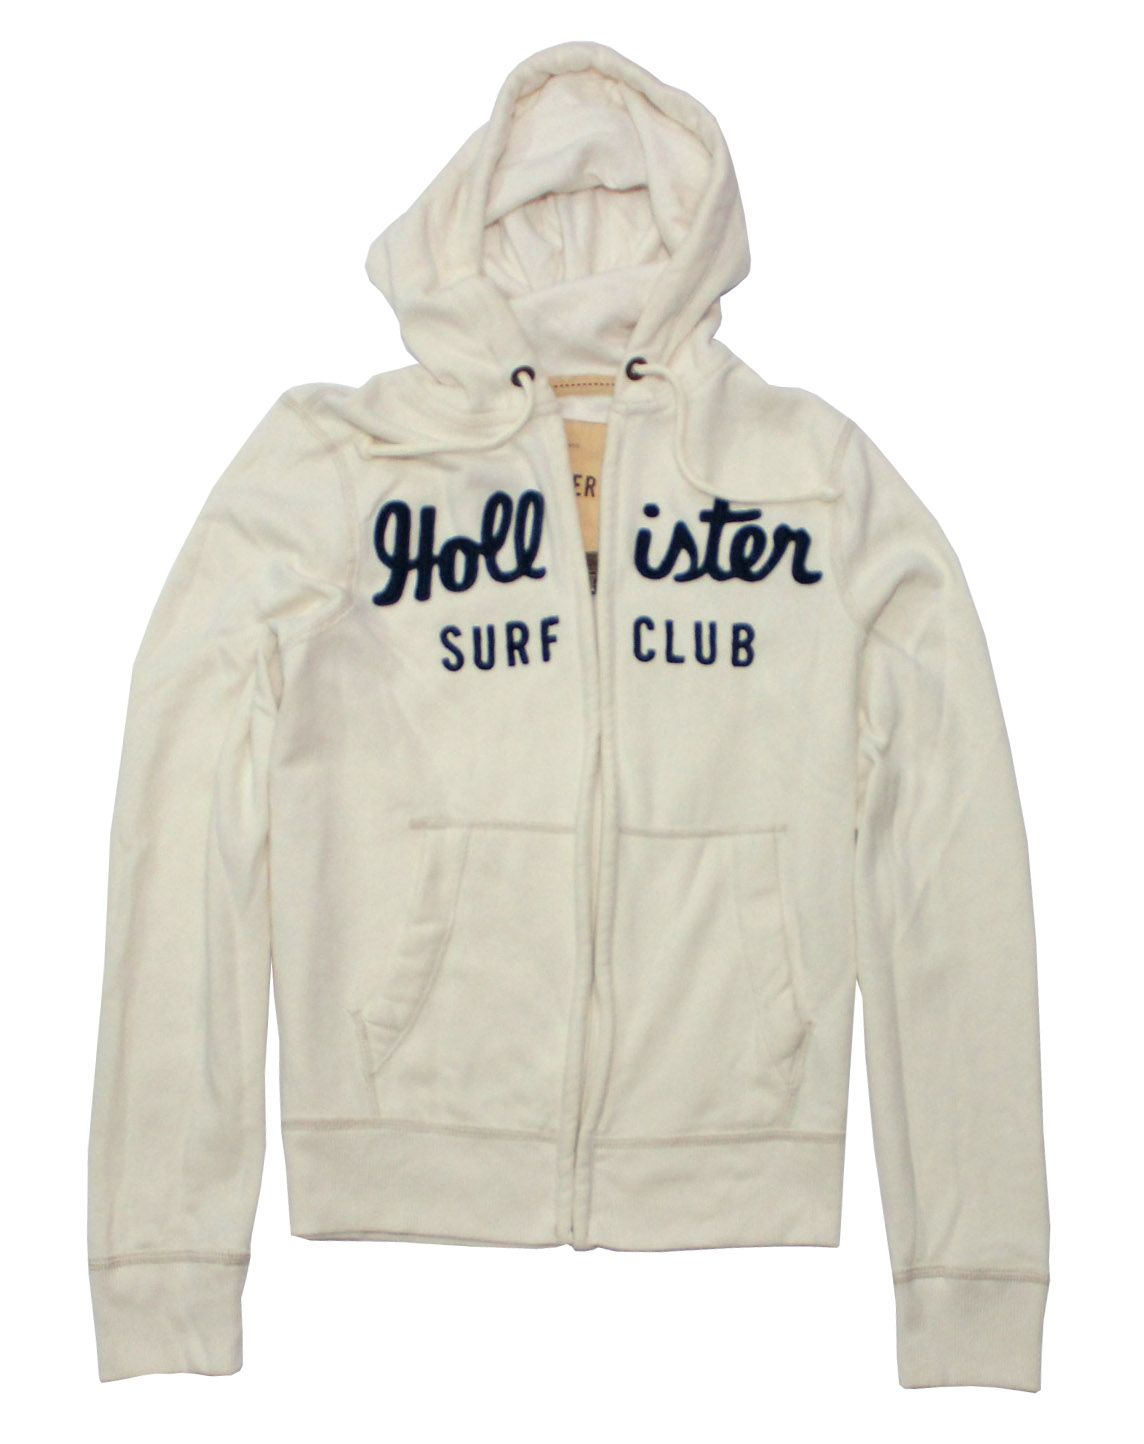 Moletom Hollister Surf Club Offwhite